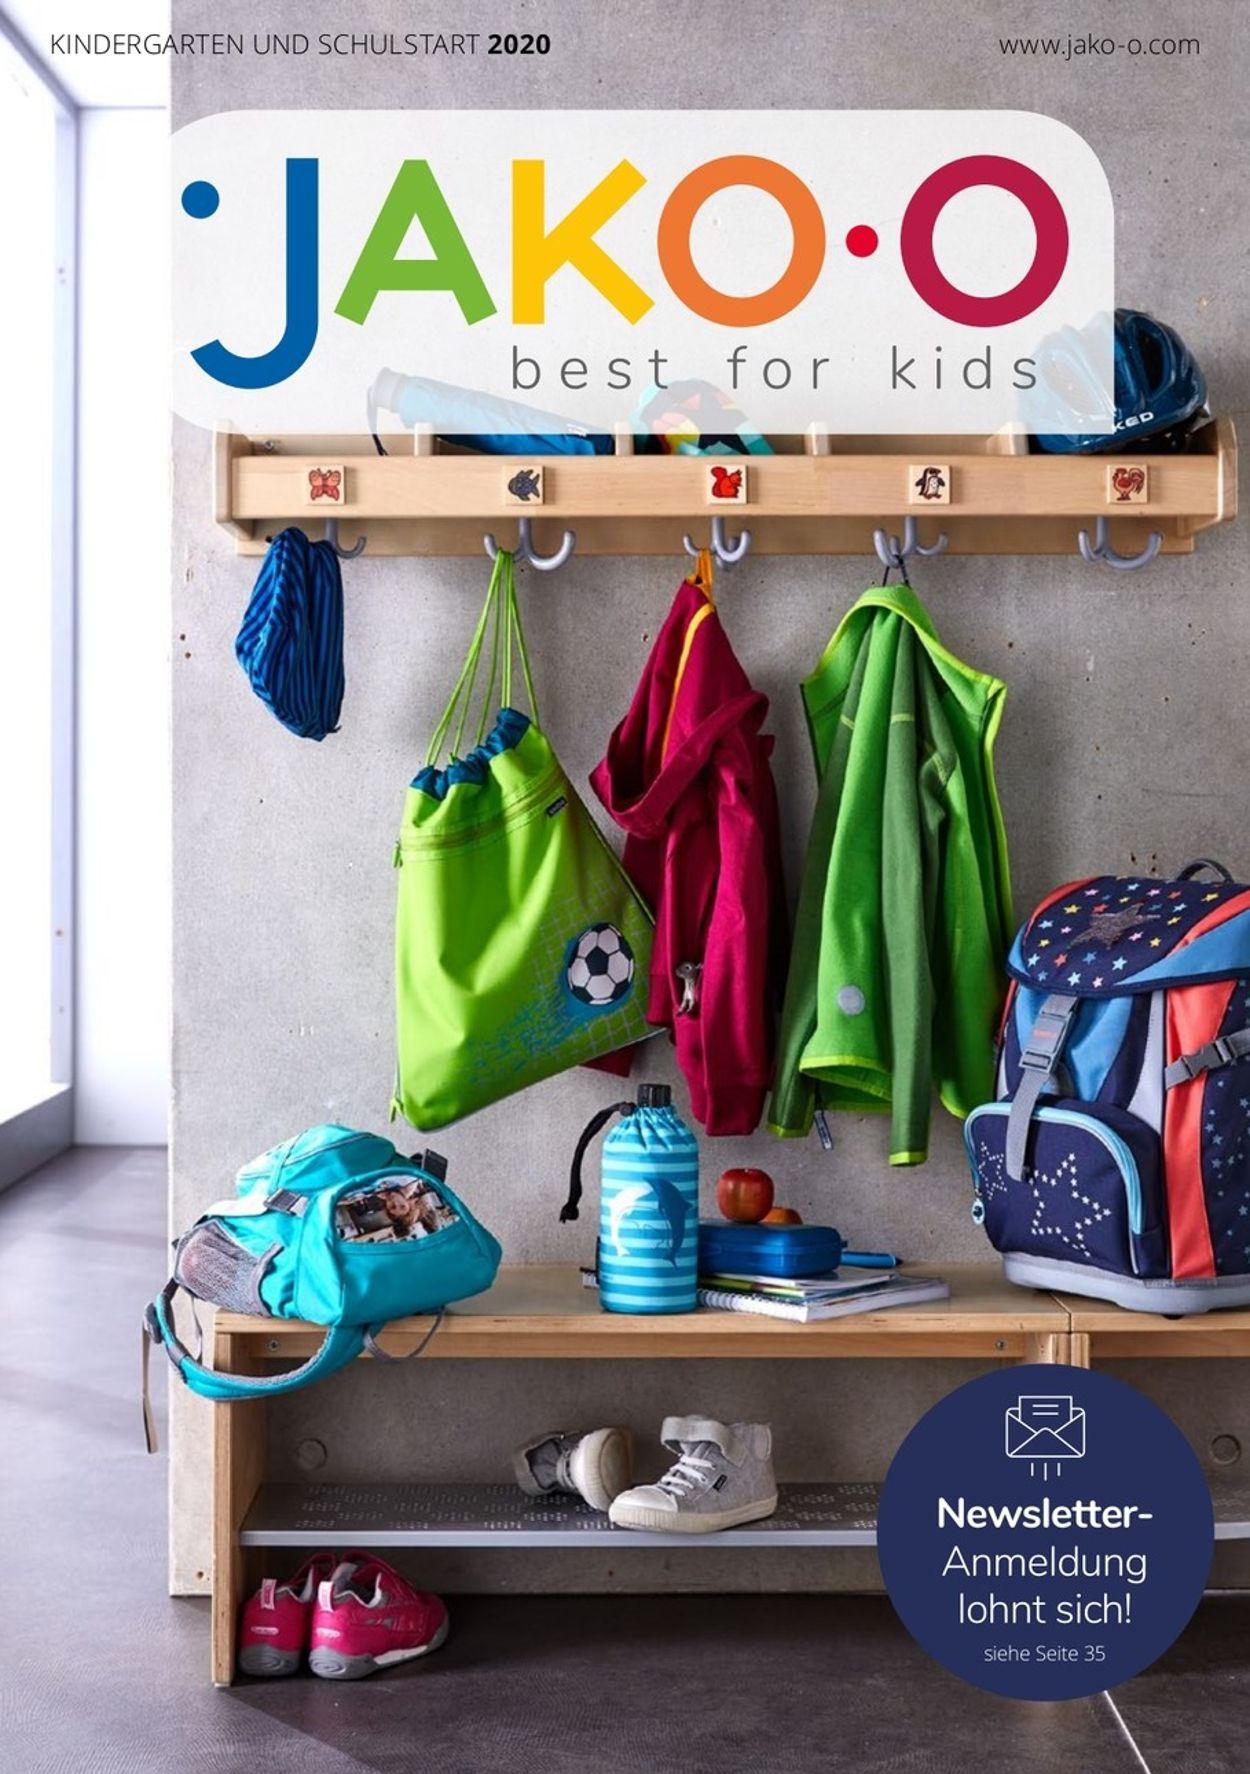 JAKO-O Prospekt - Aktuell vom 14.07-30.09.2020